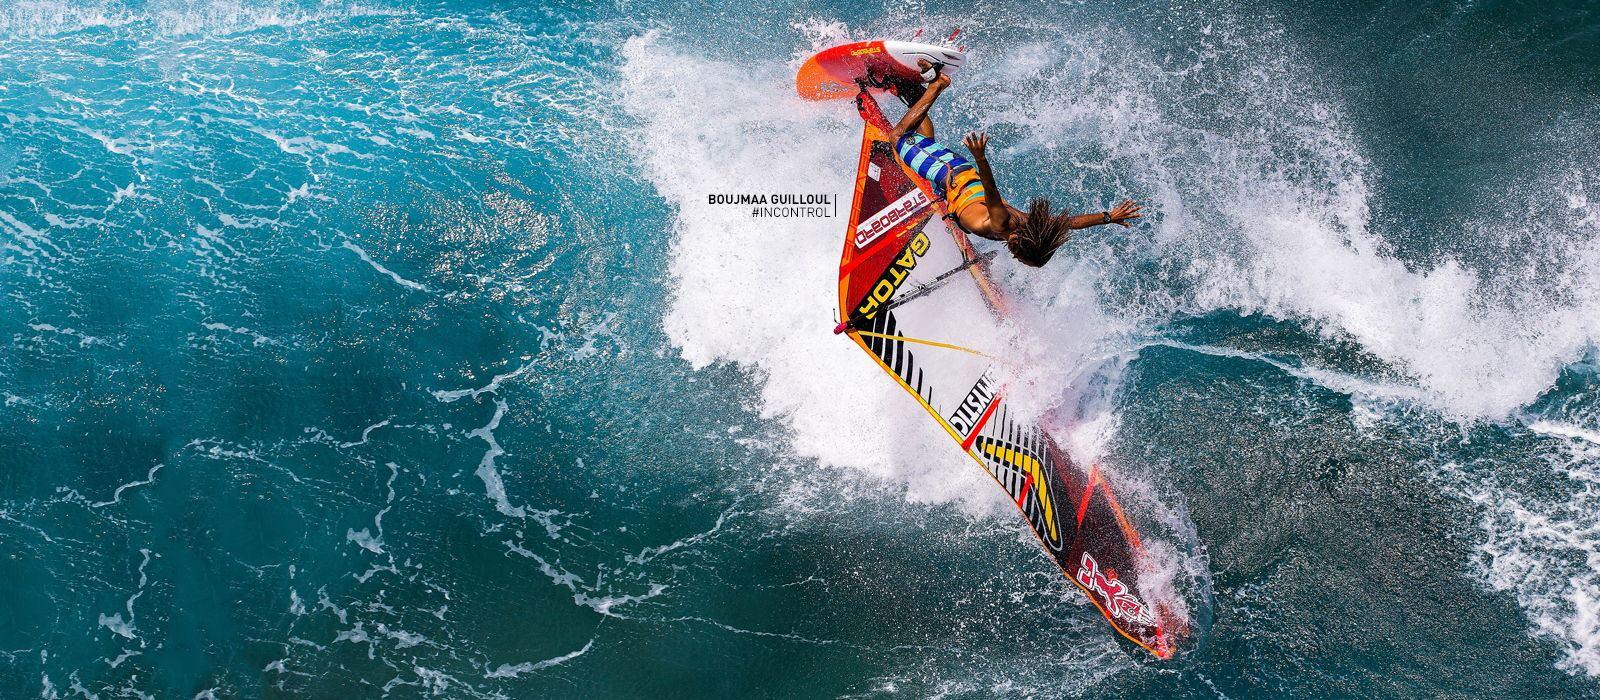 Ihram Kids For Sale Dubai: Aruba Windsurfing And Kite Surfing